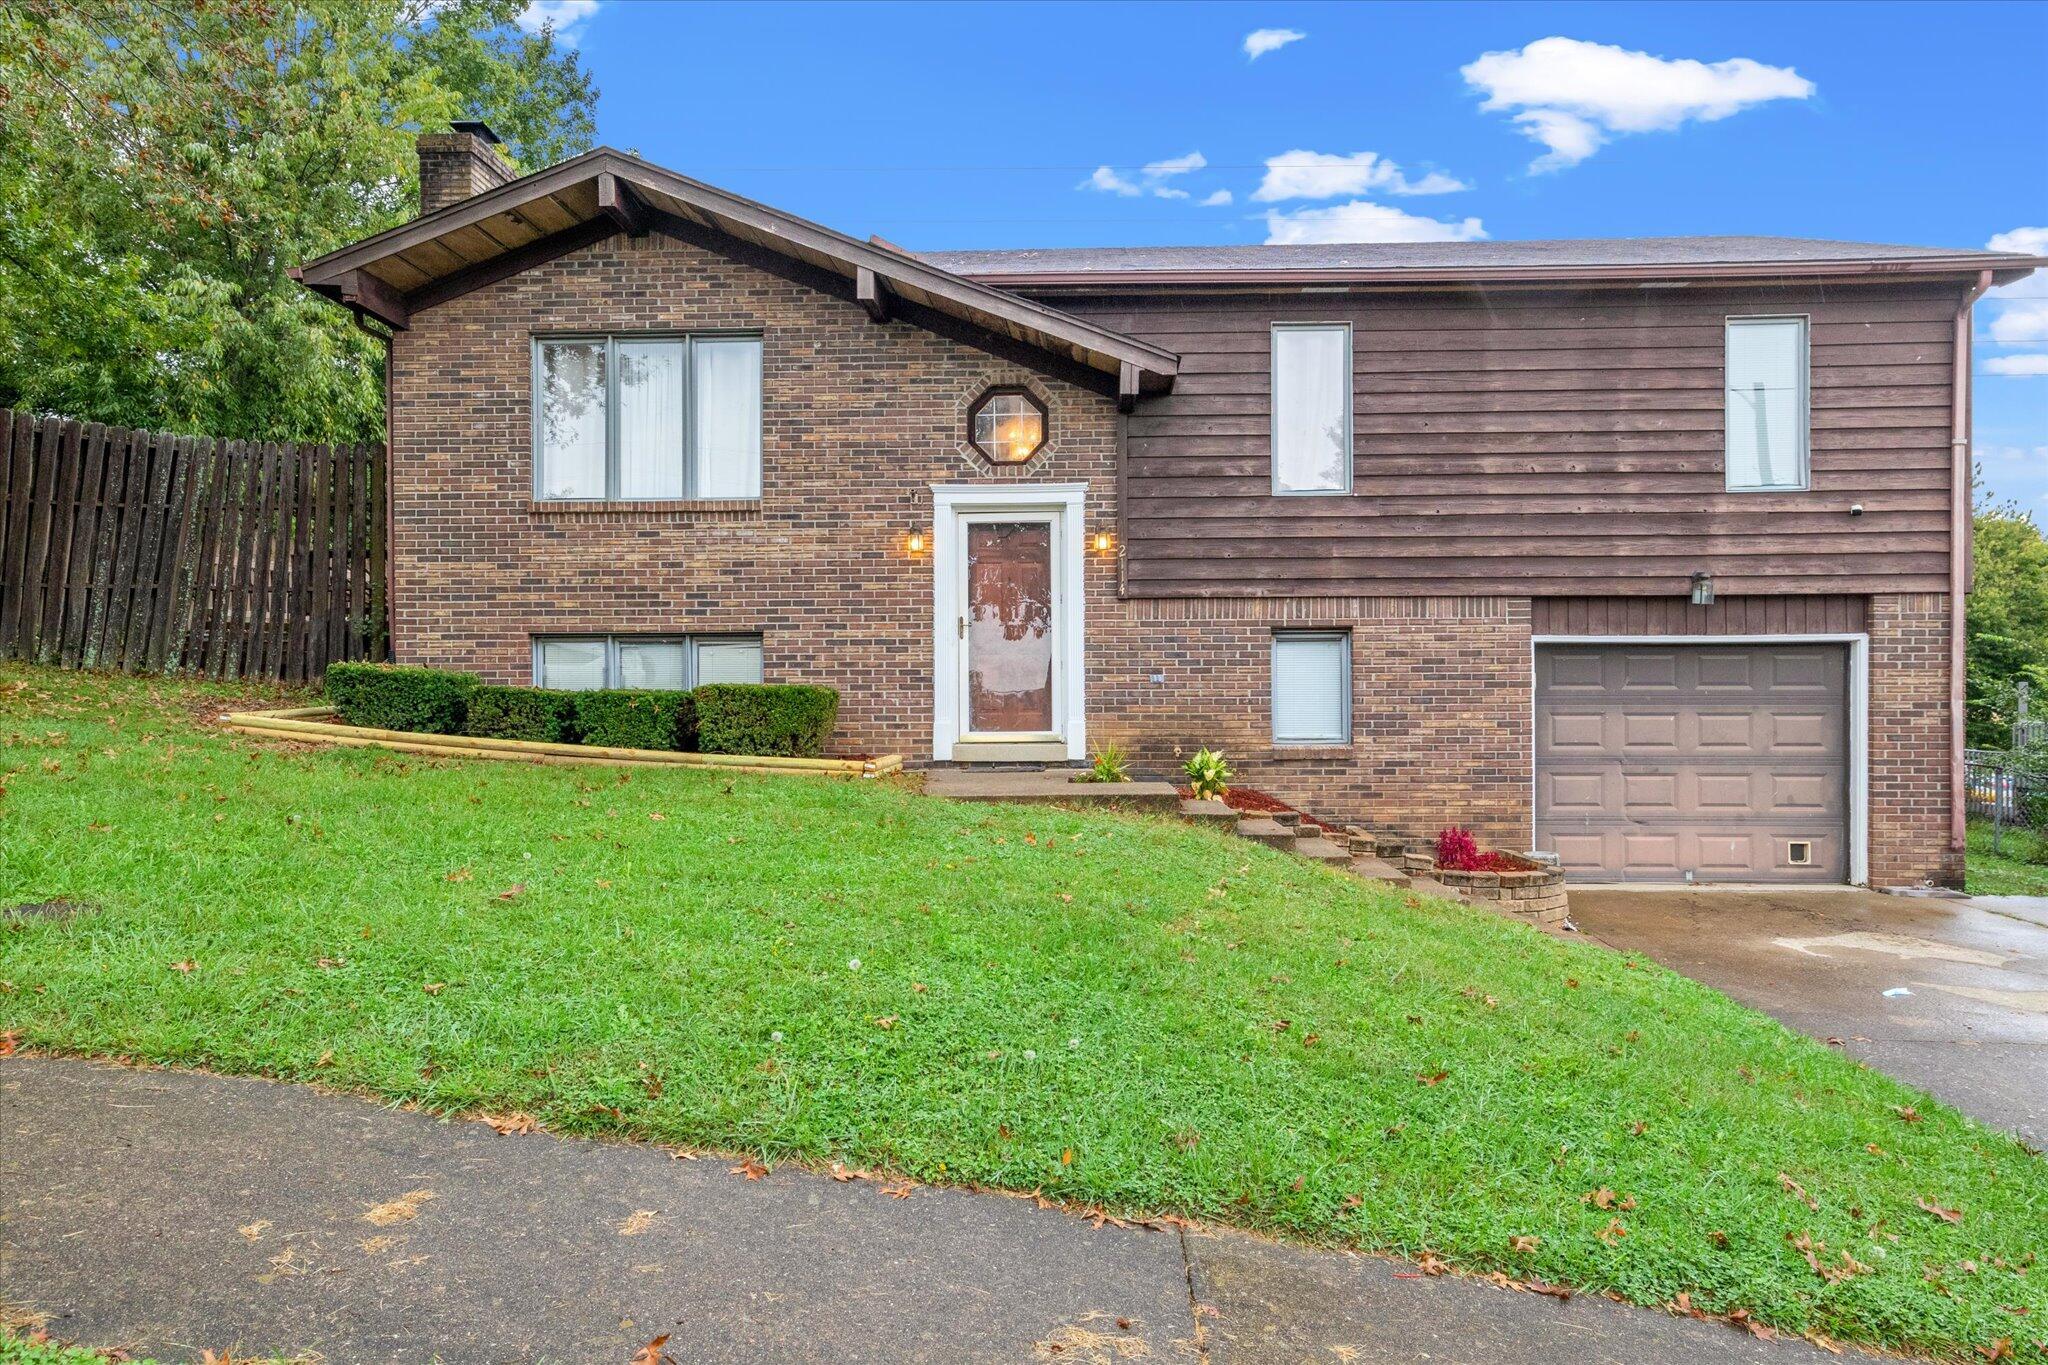 2114 Mercer Drive, Richmond, Kentucky 40475, 3 Bedrooms Bedrooms, ,3 BathroomsBathrooms,Residential,For Sale,Mercer,20122845